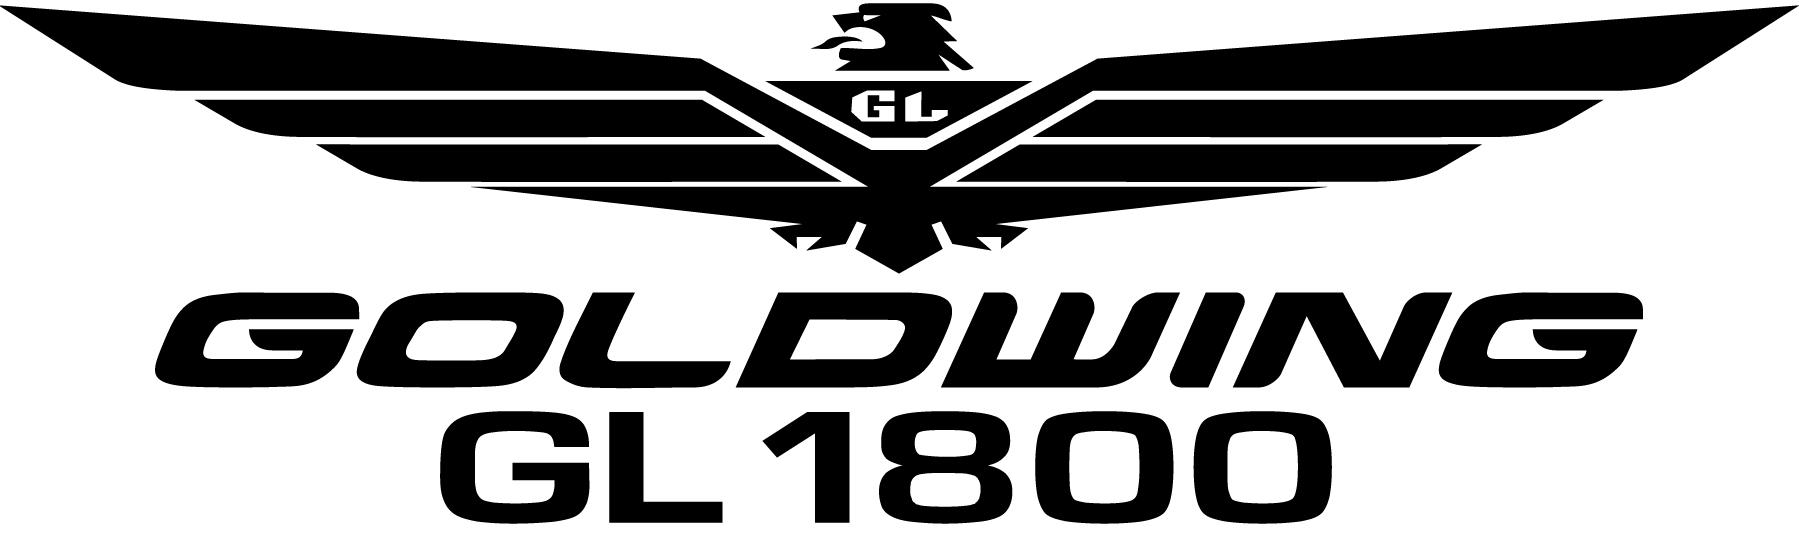 GL1800 Goldwing Logo Decal.